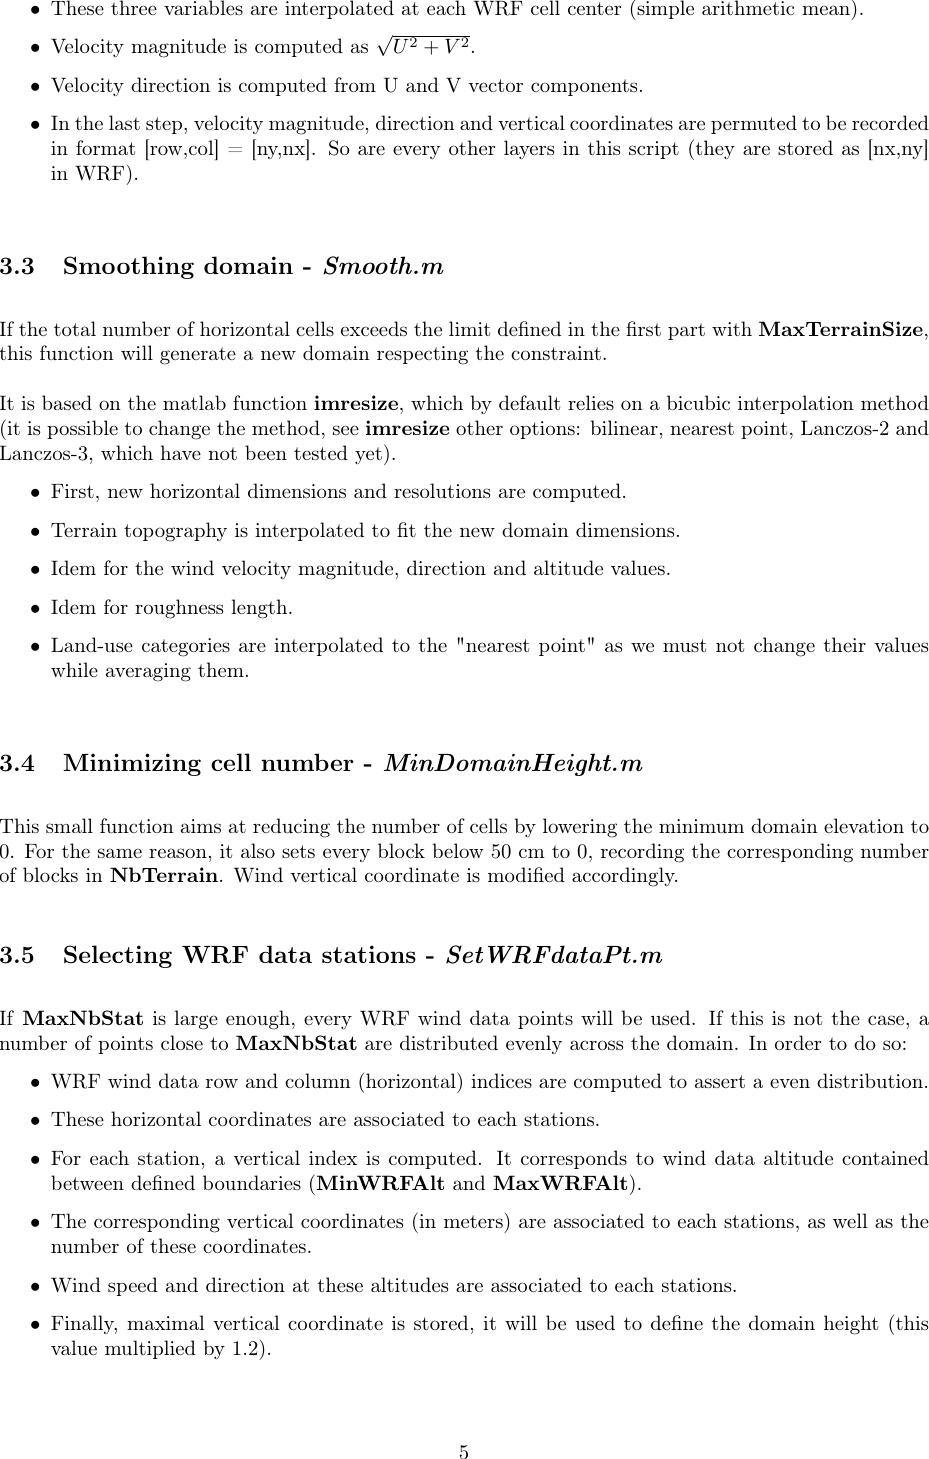 User guide WRF QUIC Coupling script